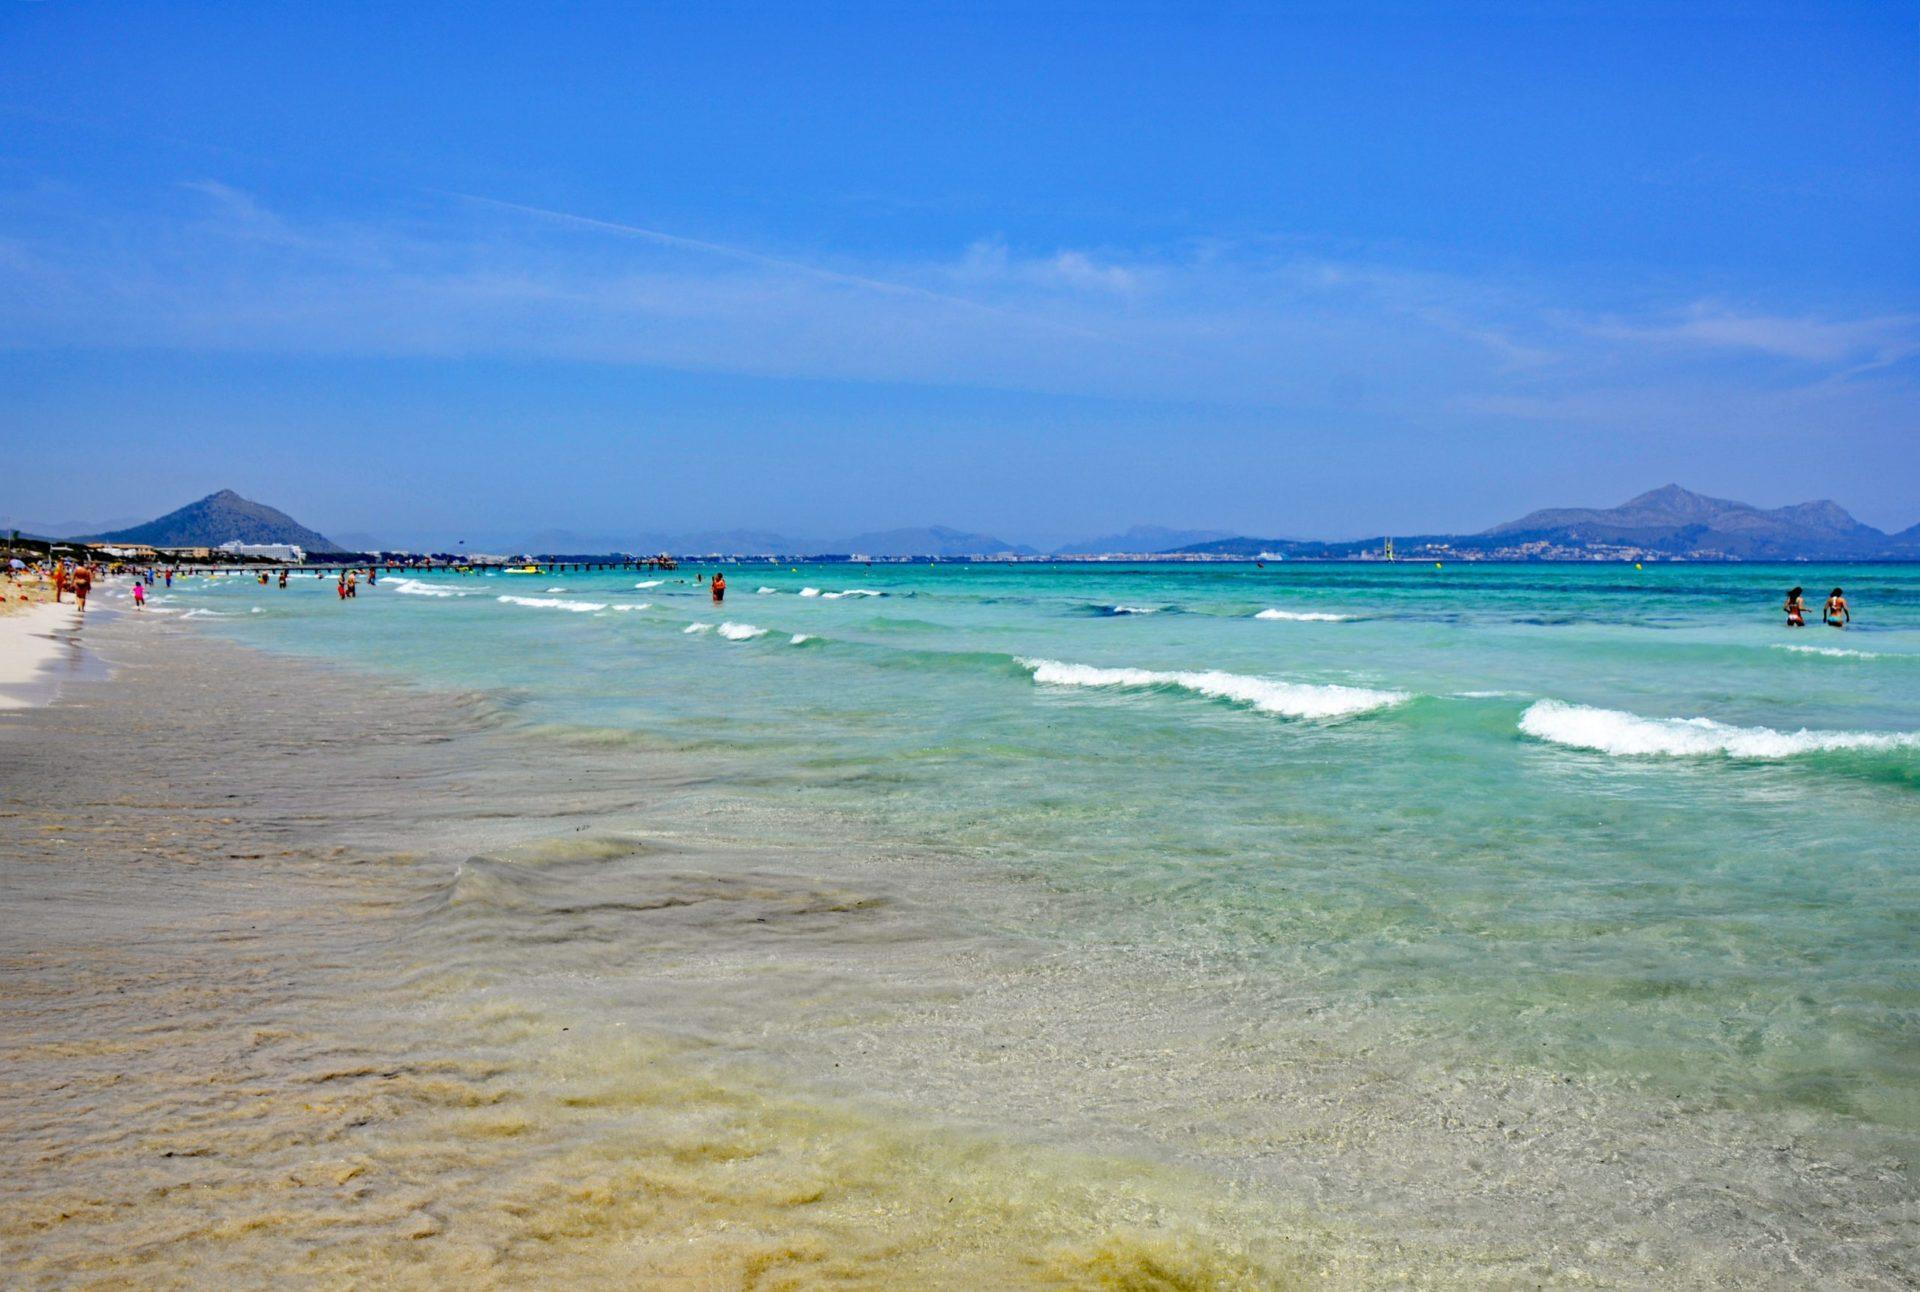 Wassertemperatur Playa de Muro